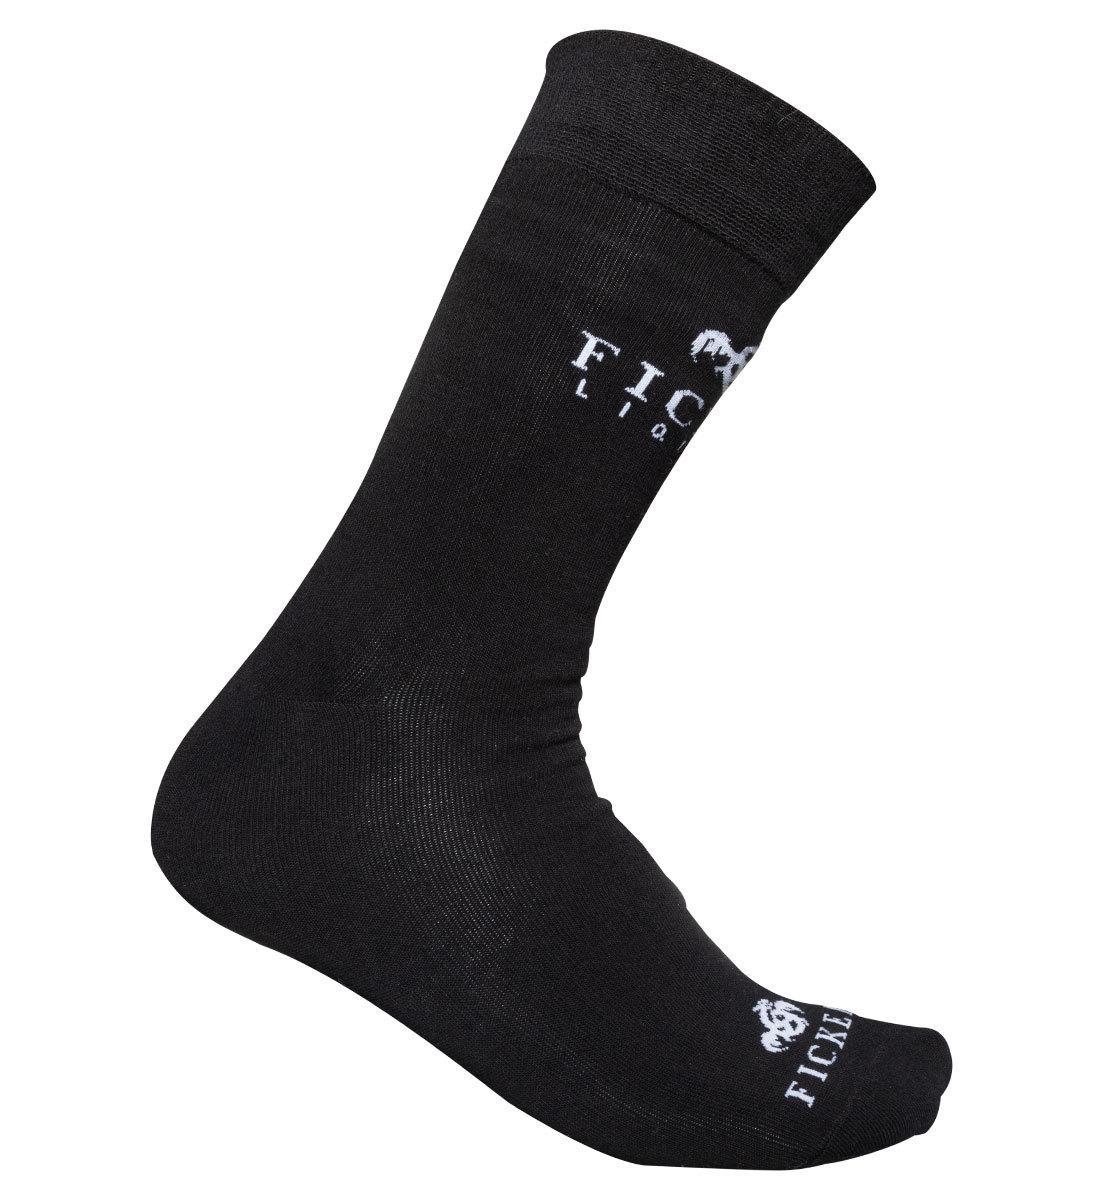 FICKEN Socken schwarz · Party Kneipe Bar